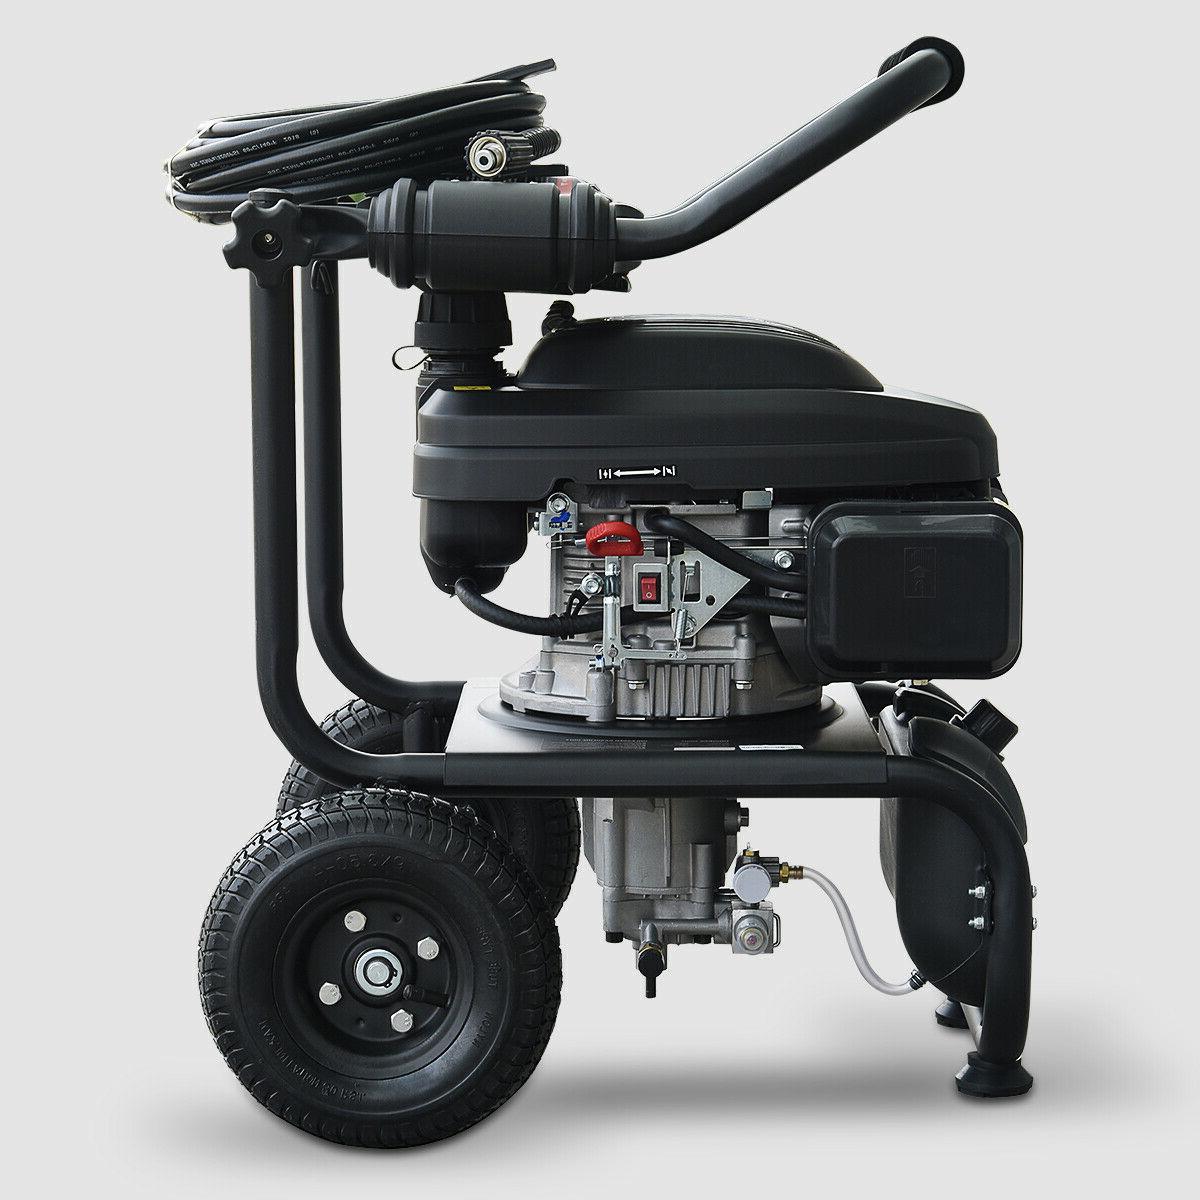 HUMBEE Tools Psi Washer, EPA CARB